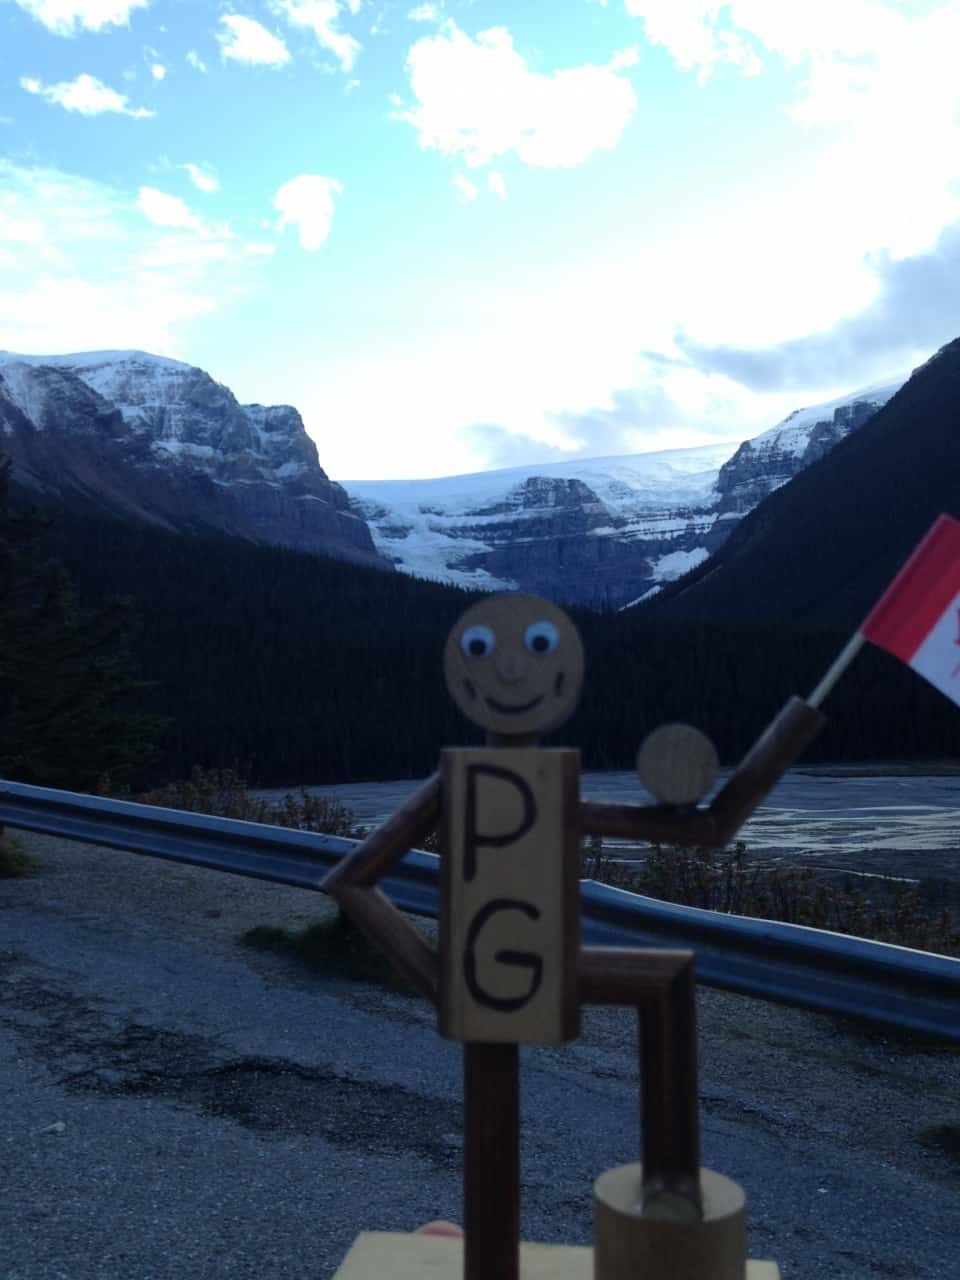 33902245ac720dfeeee2cbad.jpg - Outside of Banff, AB - Calgary road trip fall 2014